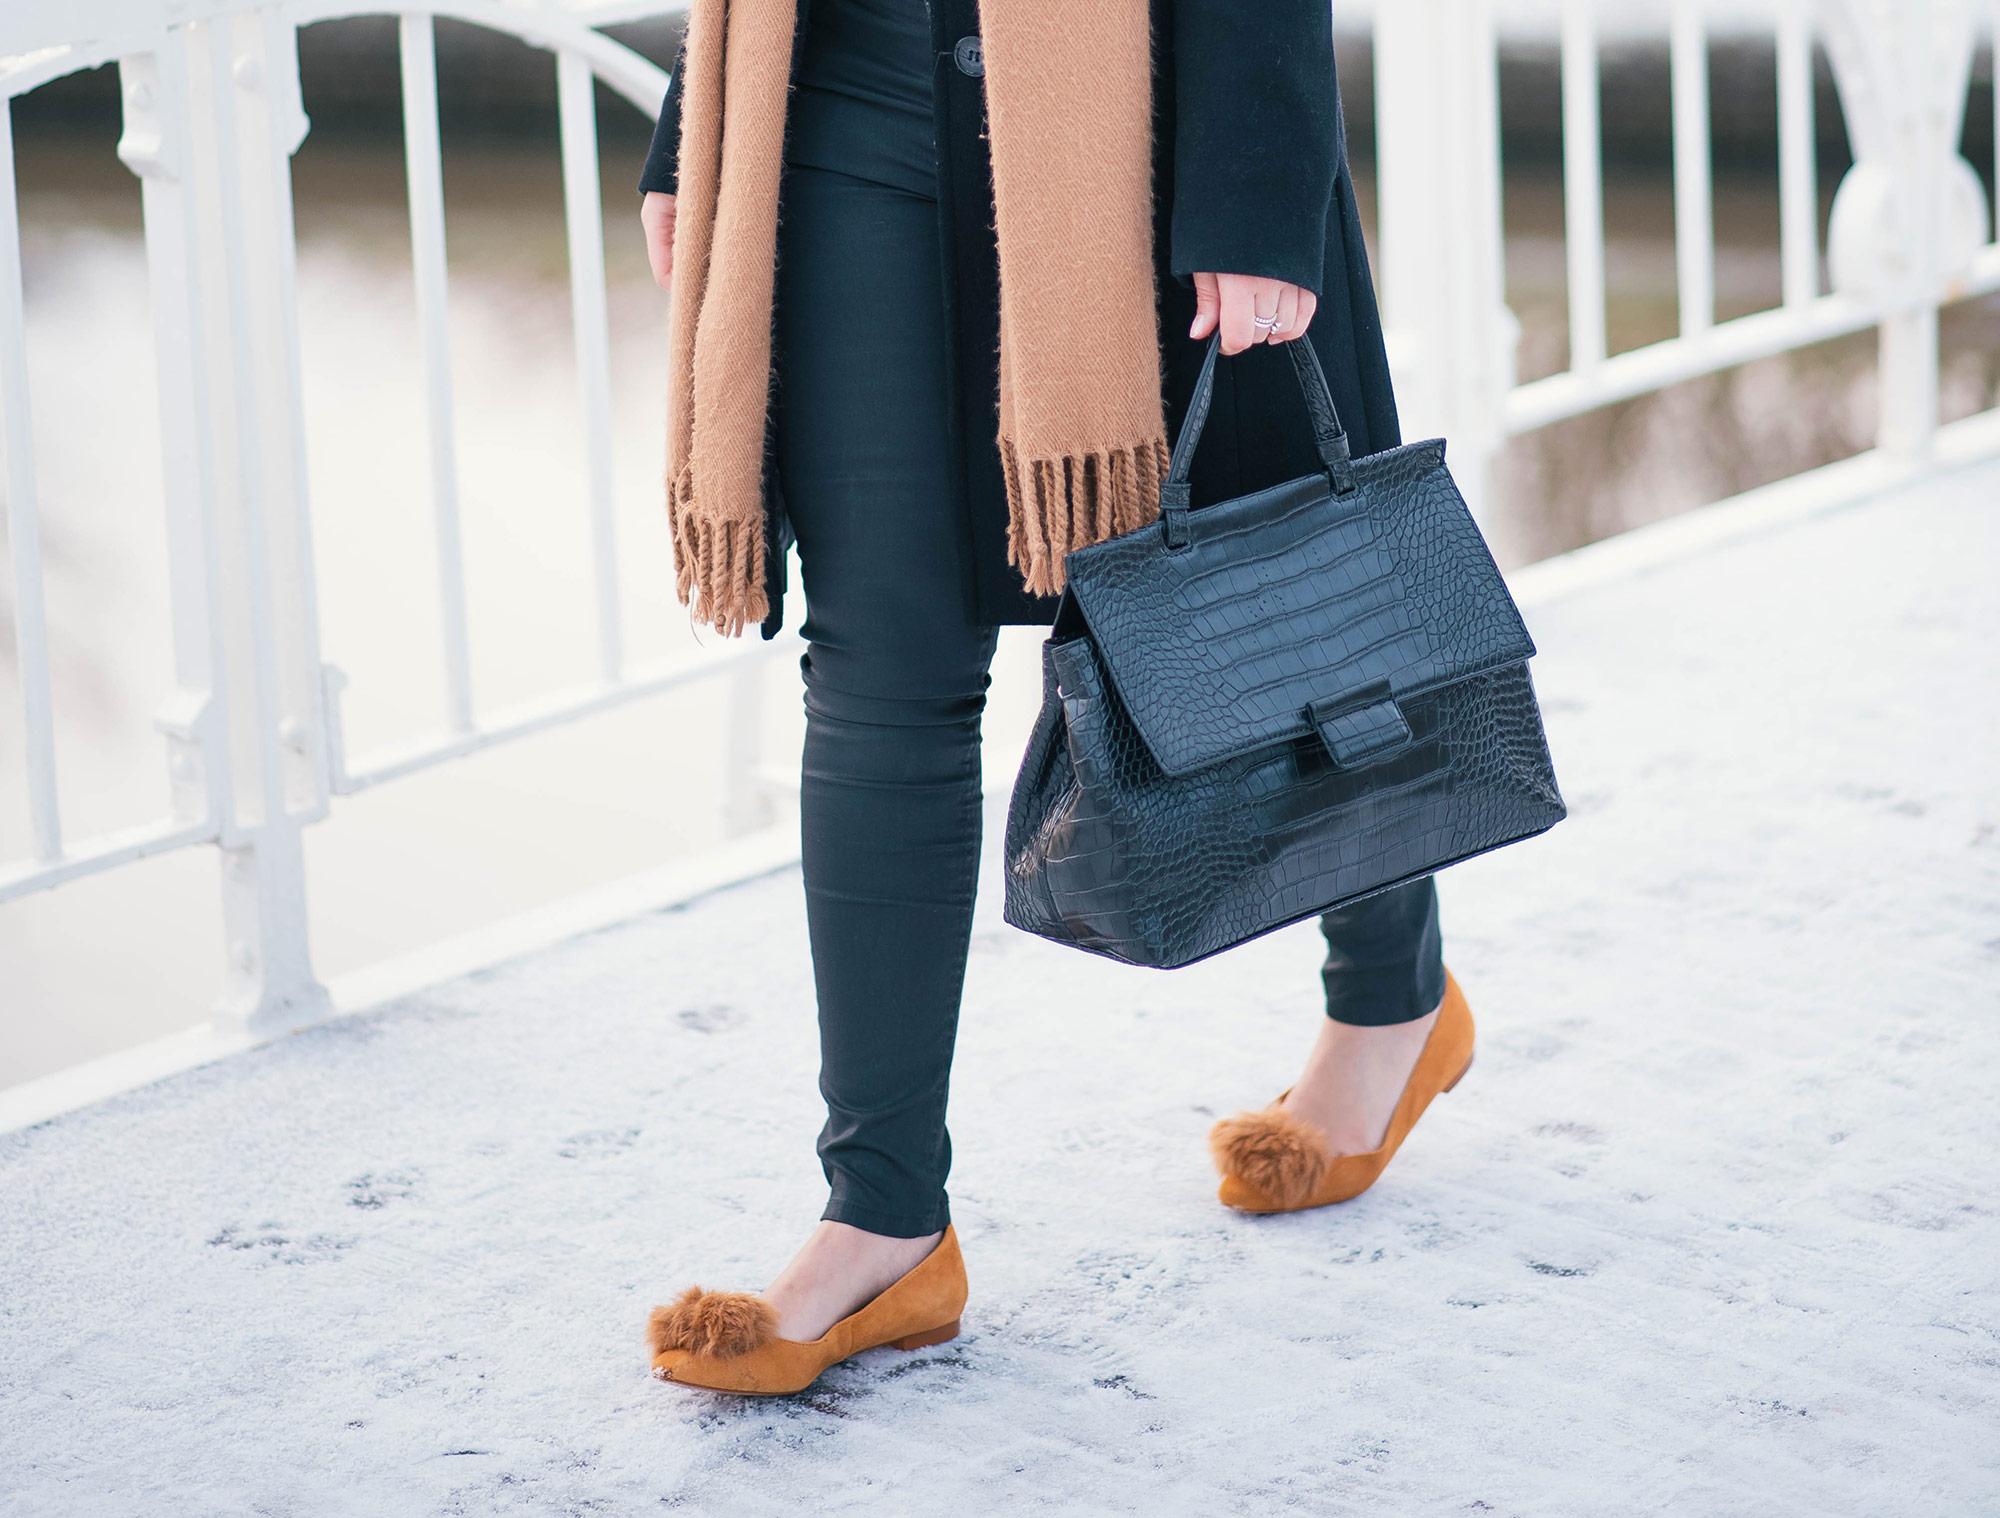 pom-pom-shoes-thepetitecat-style